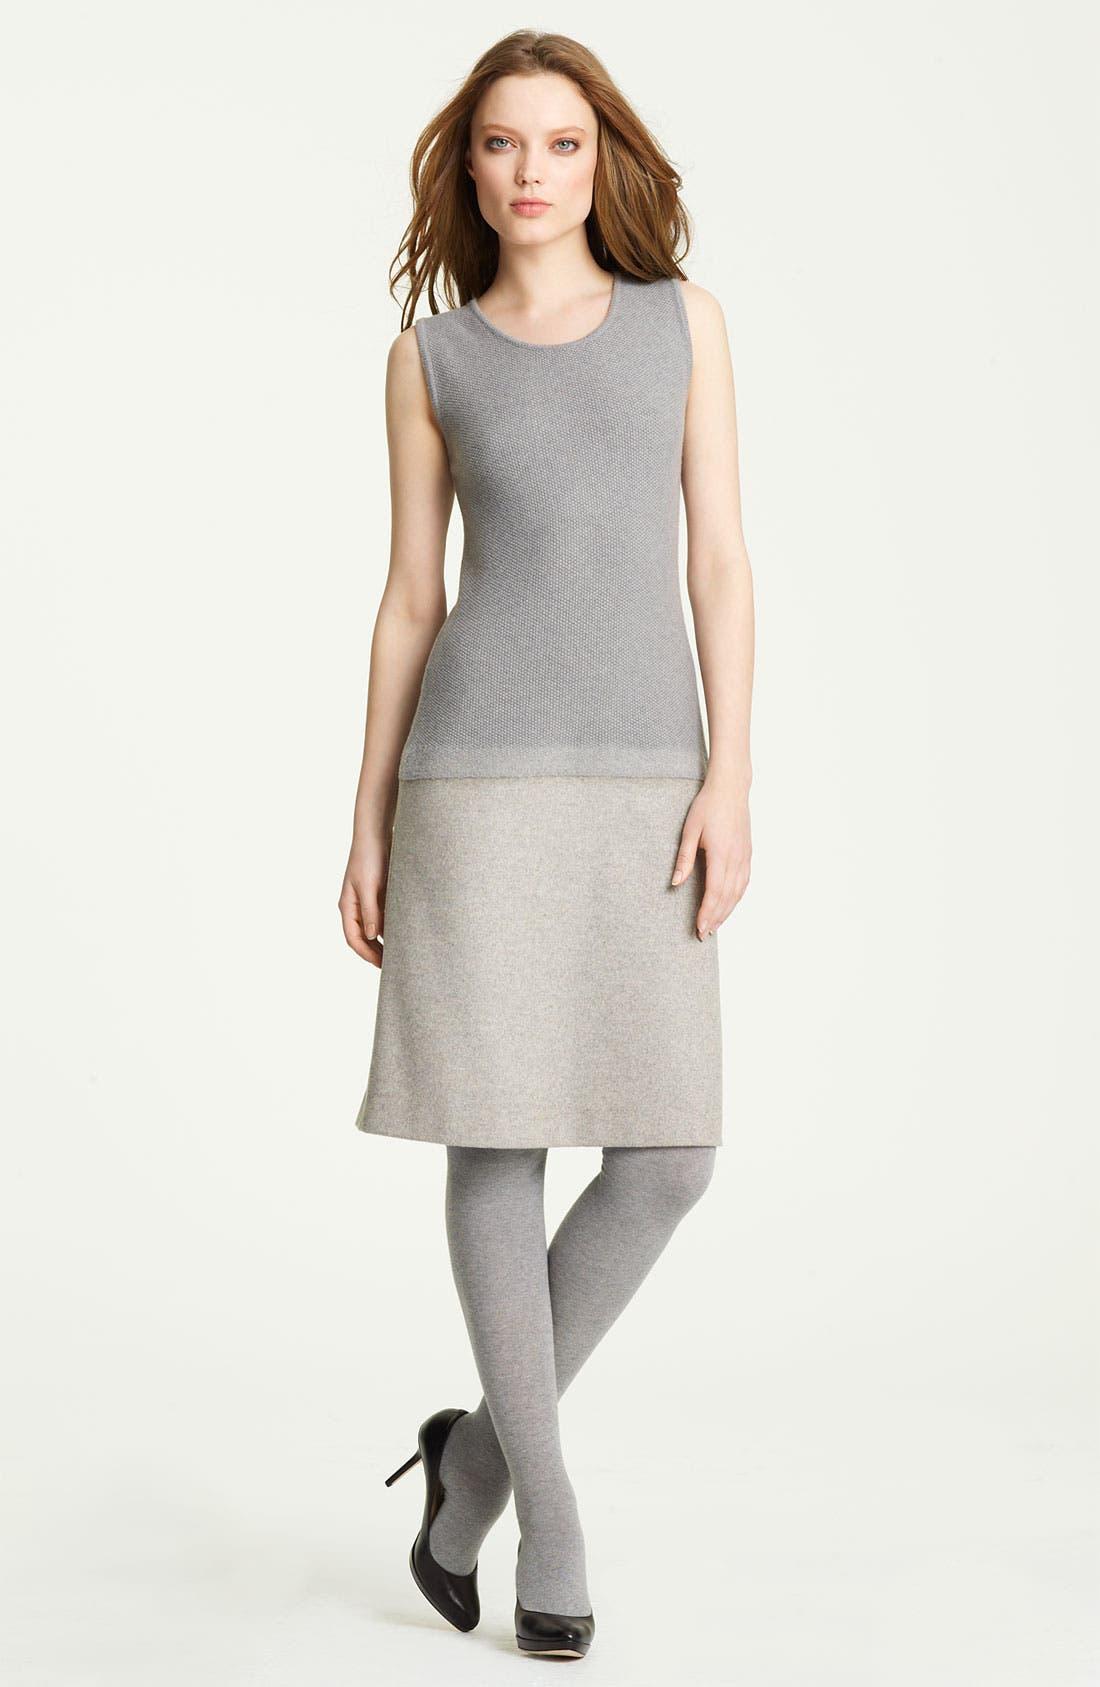 Alternate Image 1 Selected - Fabiana Filippi Knit & Felt Wool Blend Dress